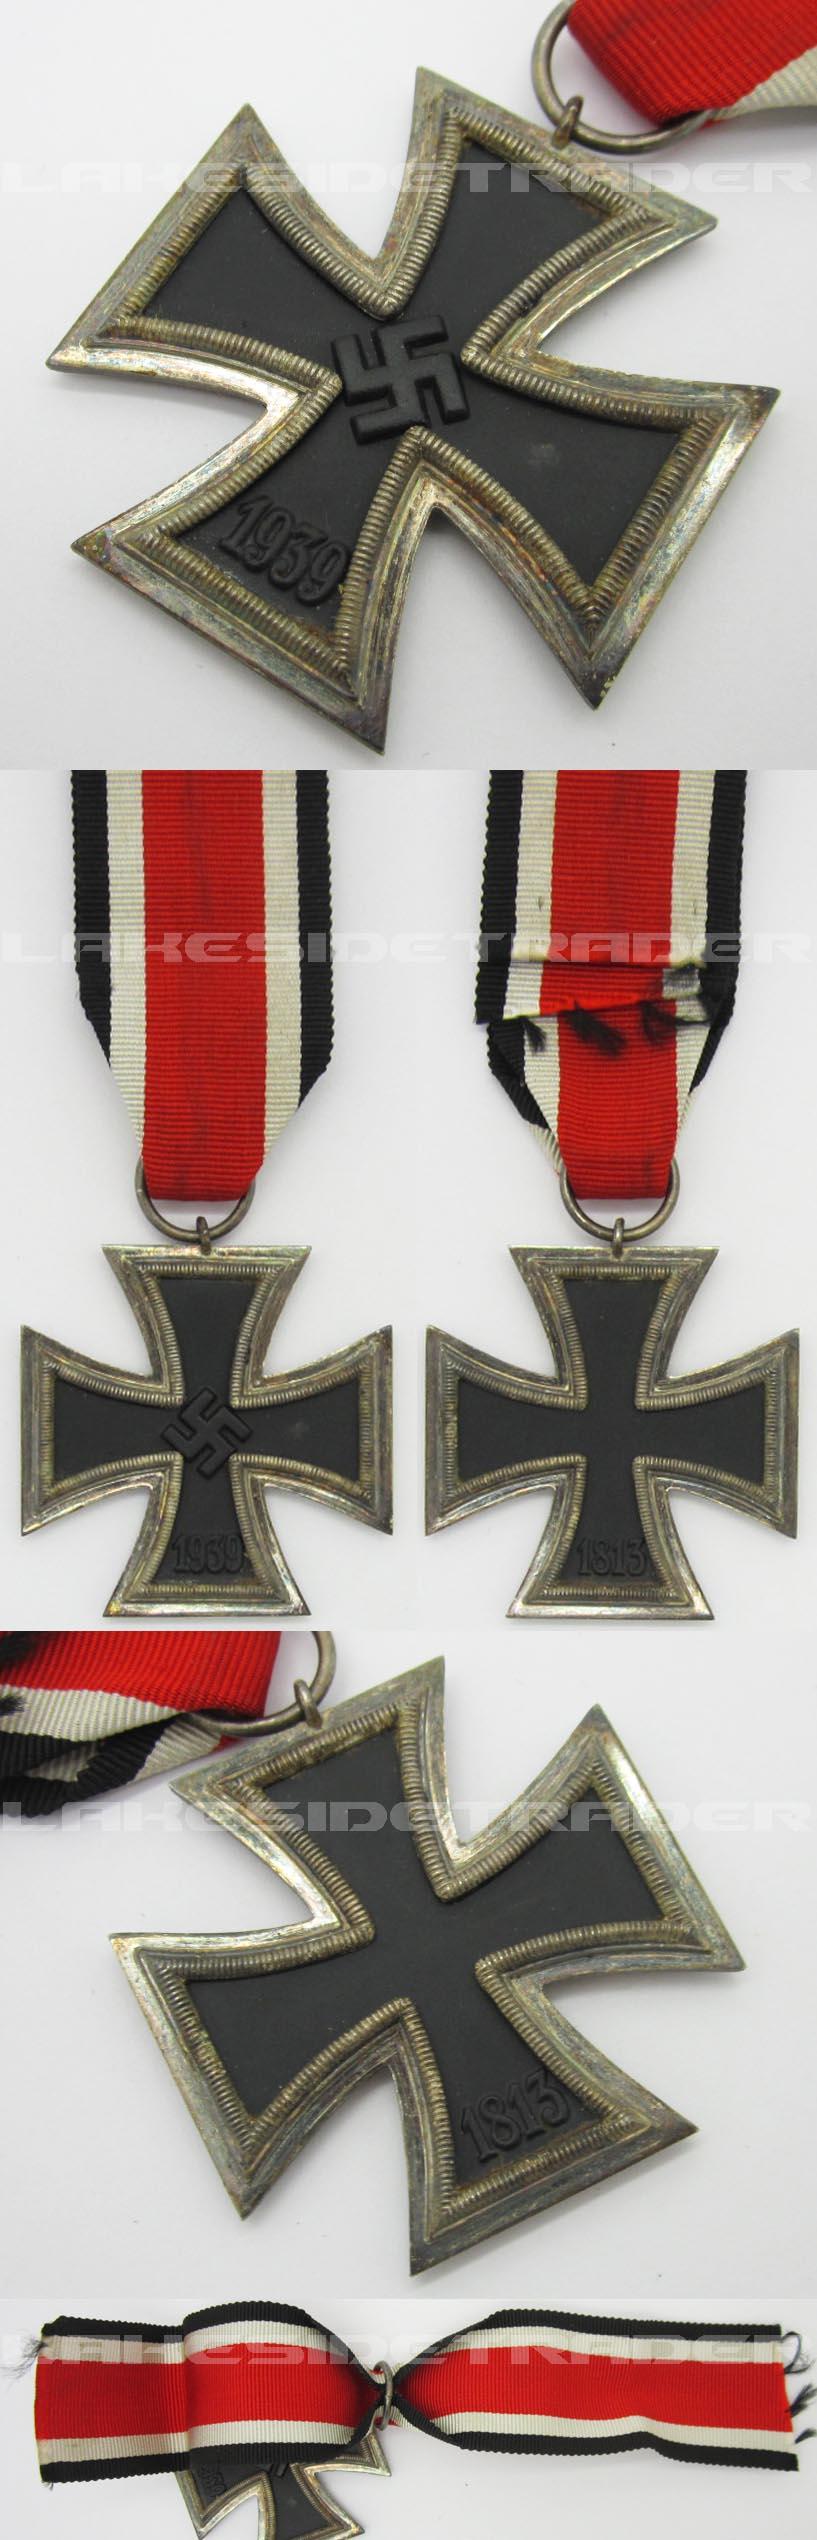 Kurt Rohrbeck's Knights Cross Award Grouping